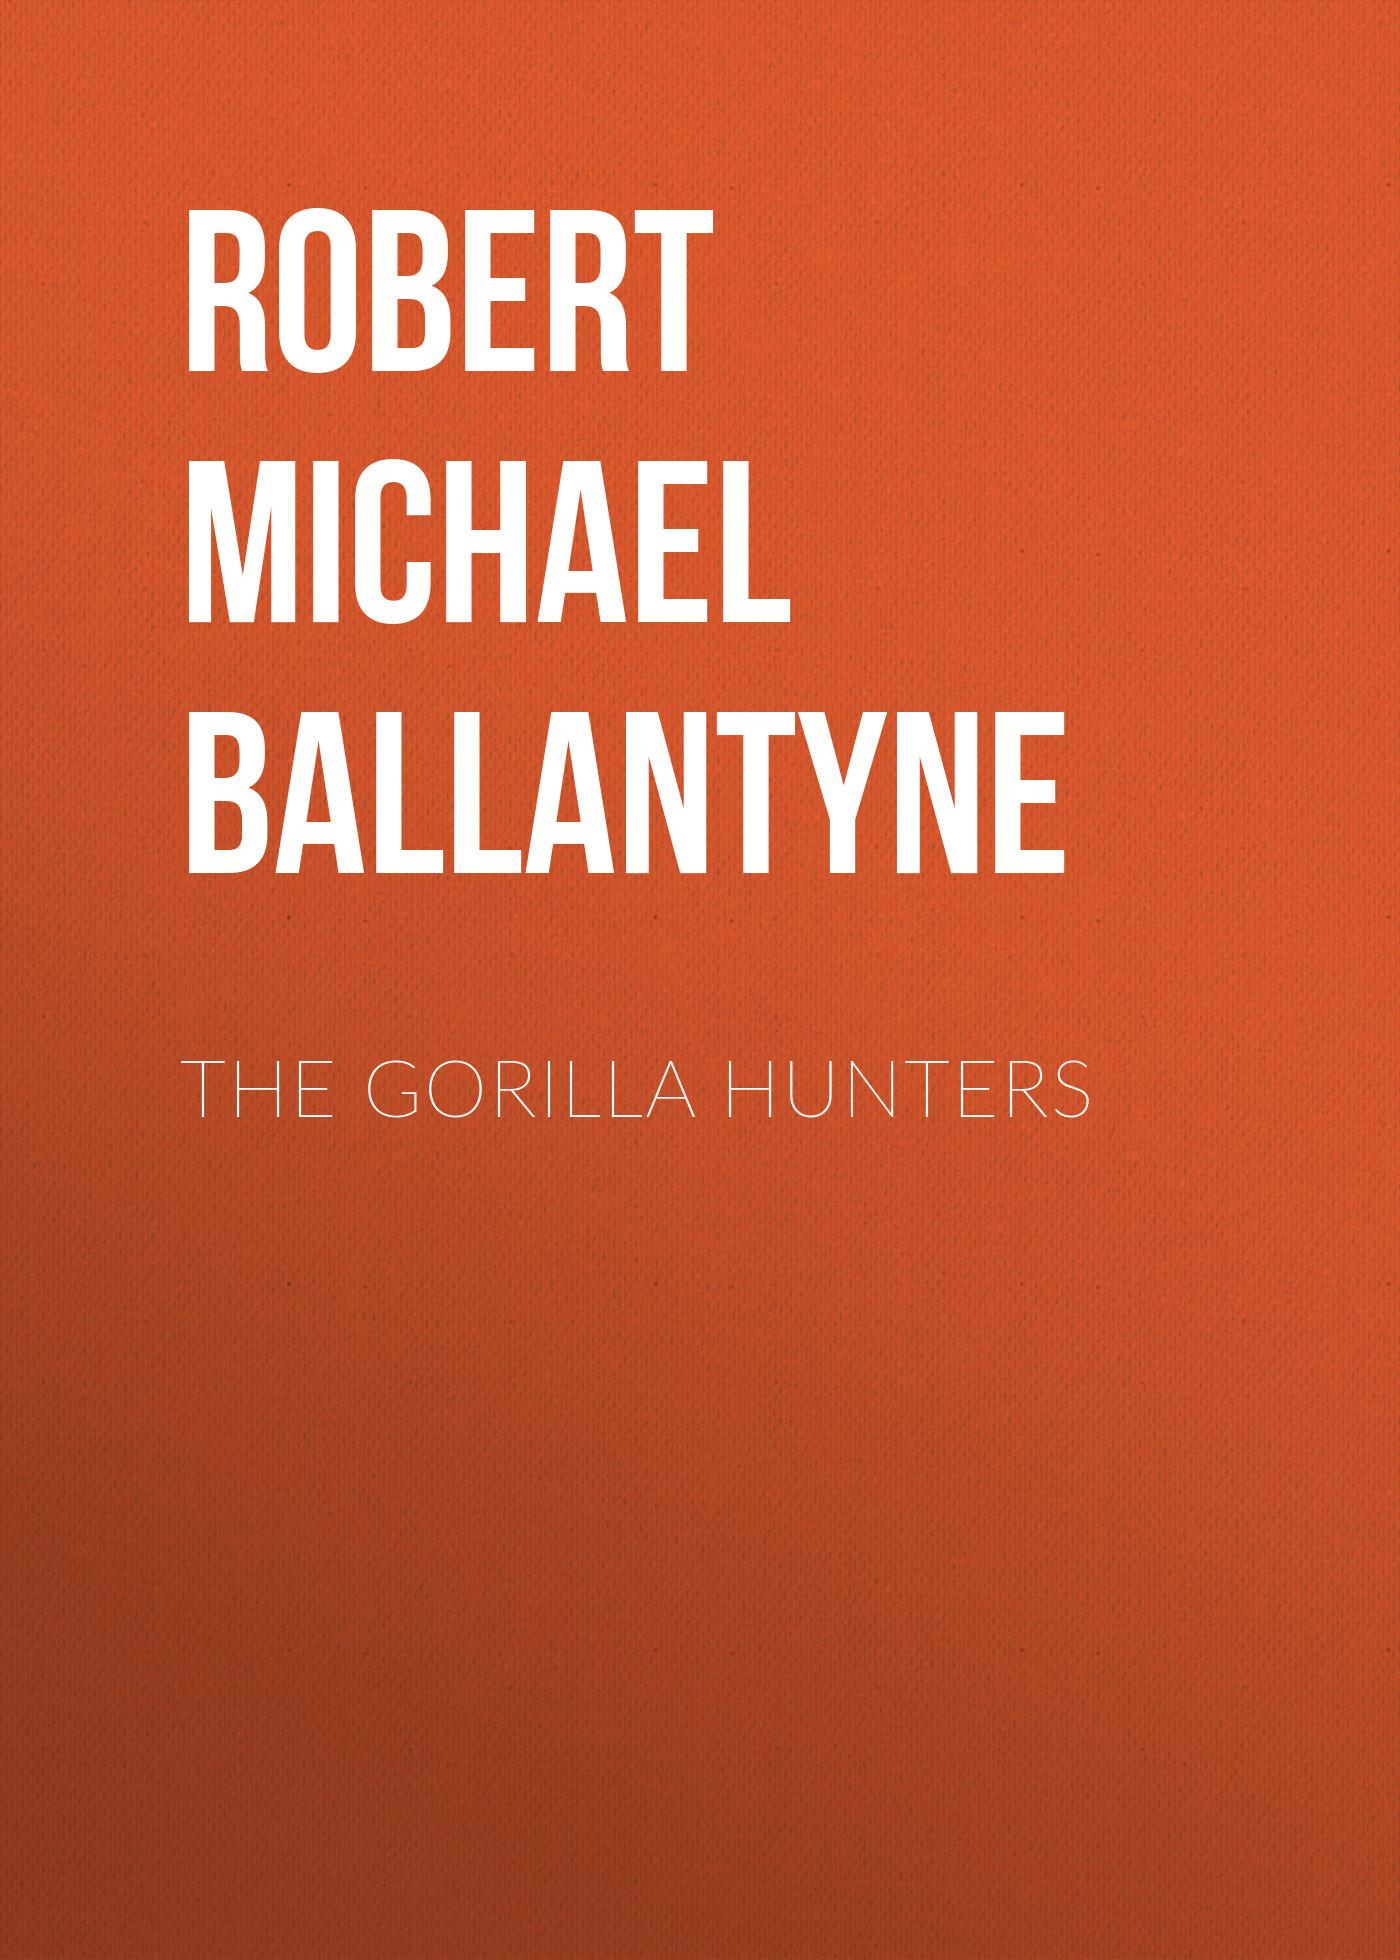 Robert Michael Ballantyne The Gorilla Hunters robert michael ballantyne saved by the lifeboat